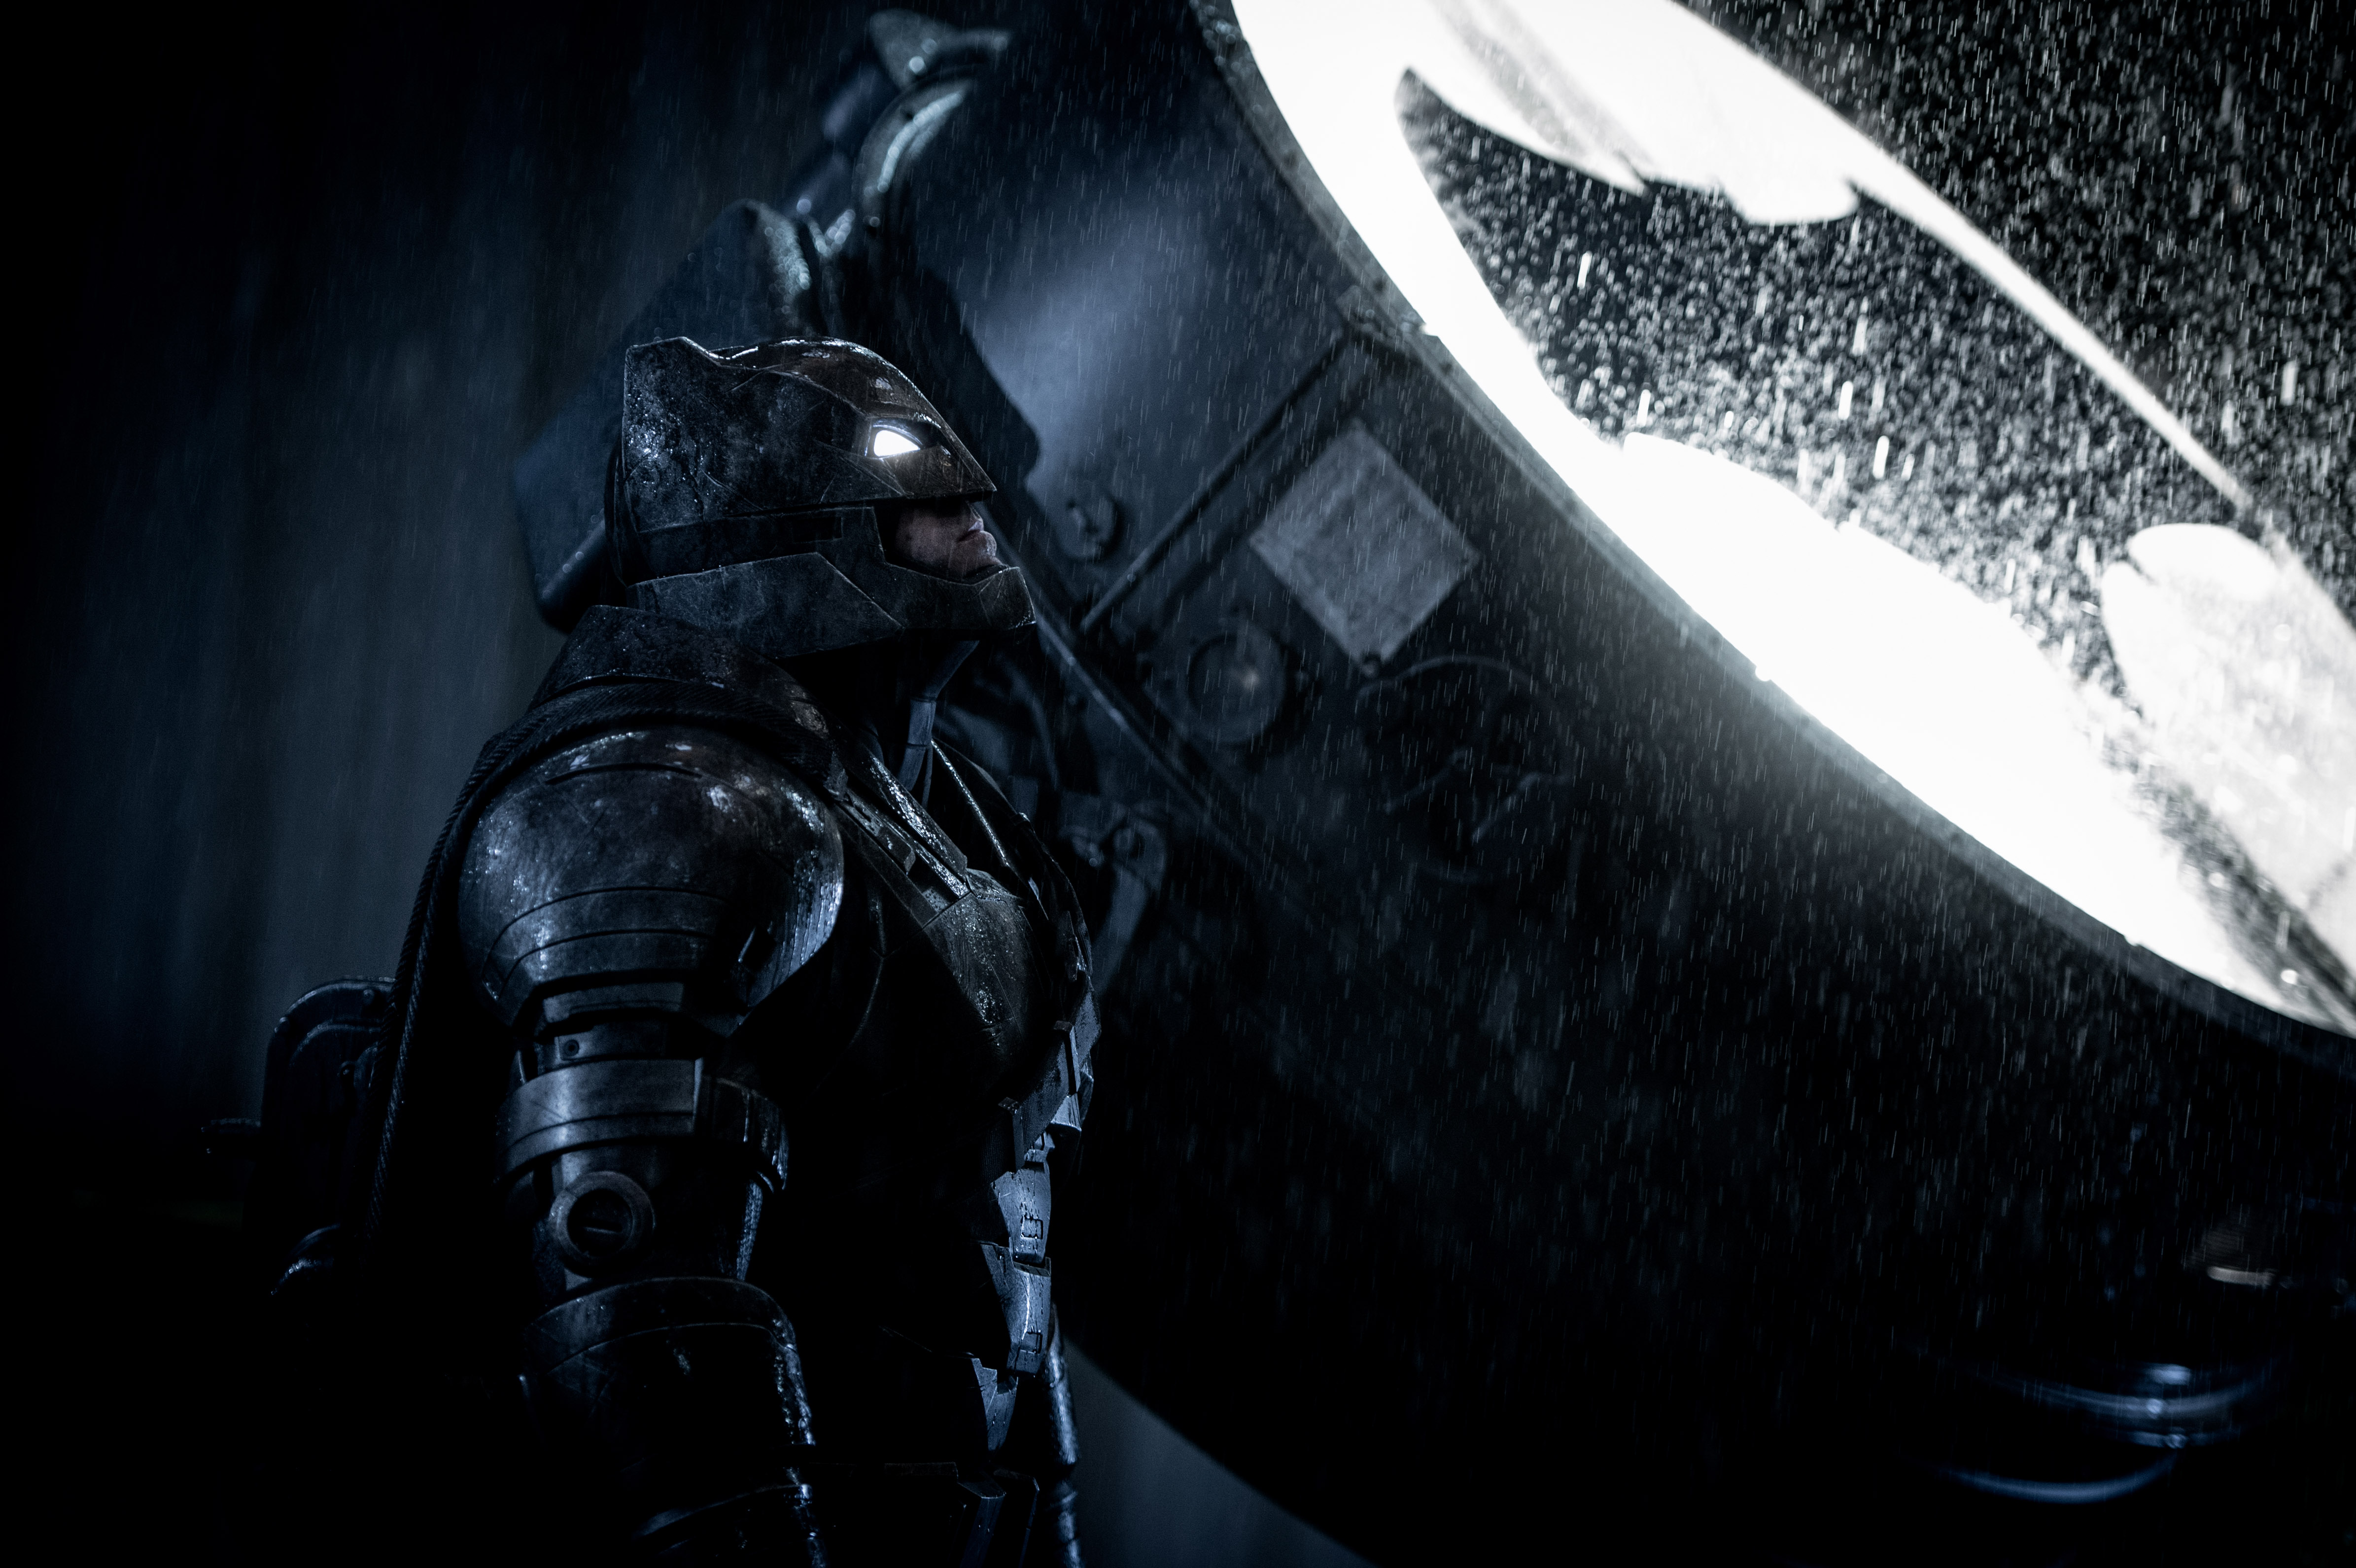 batman v superma imagen batiseñal